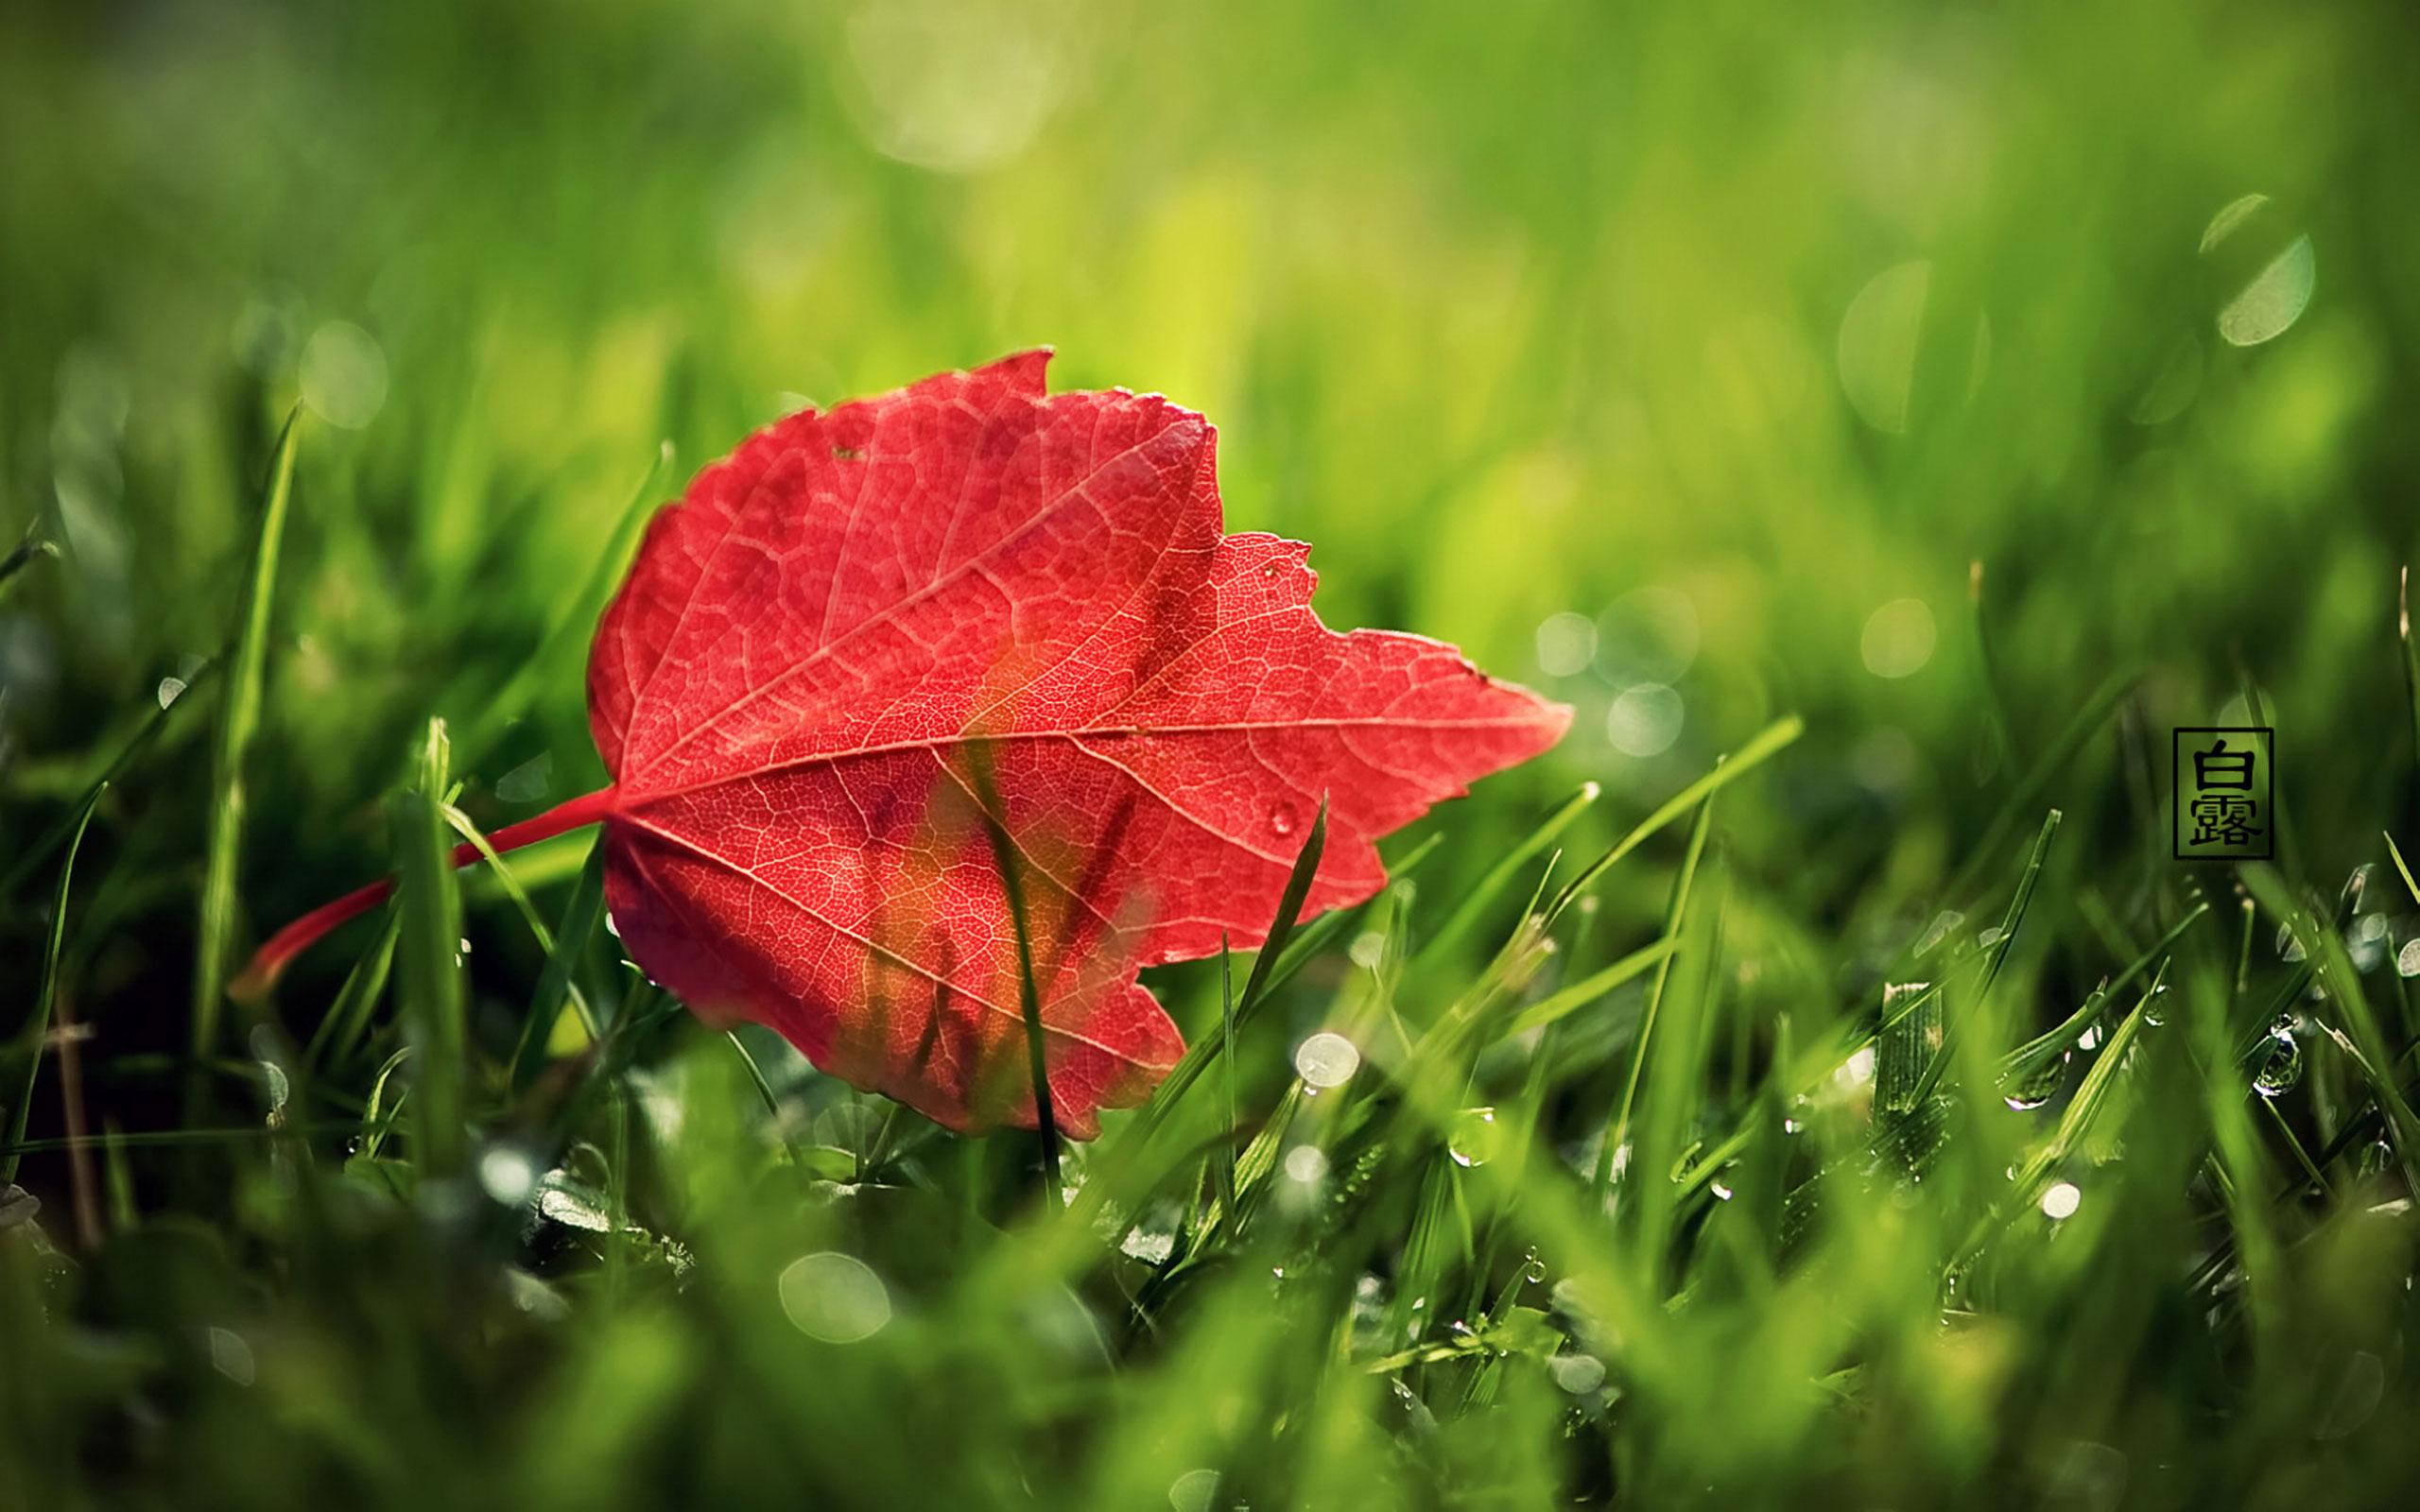 Windows 10 Wallpaper Red Leaf